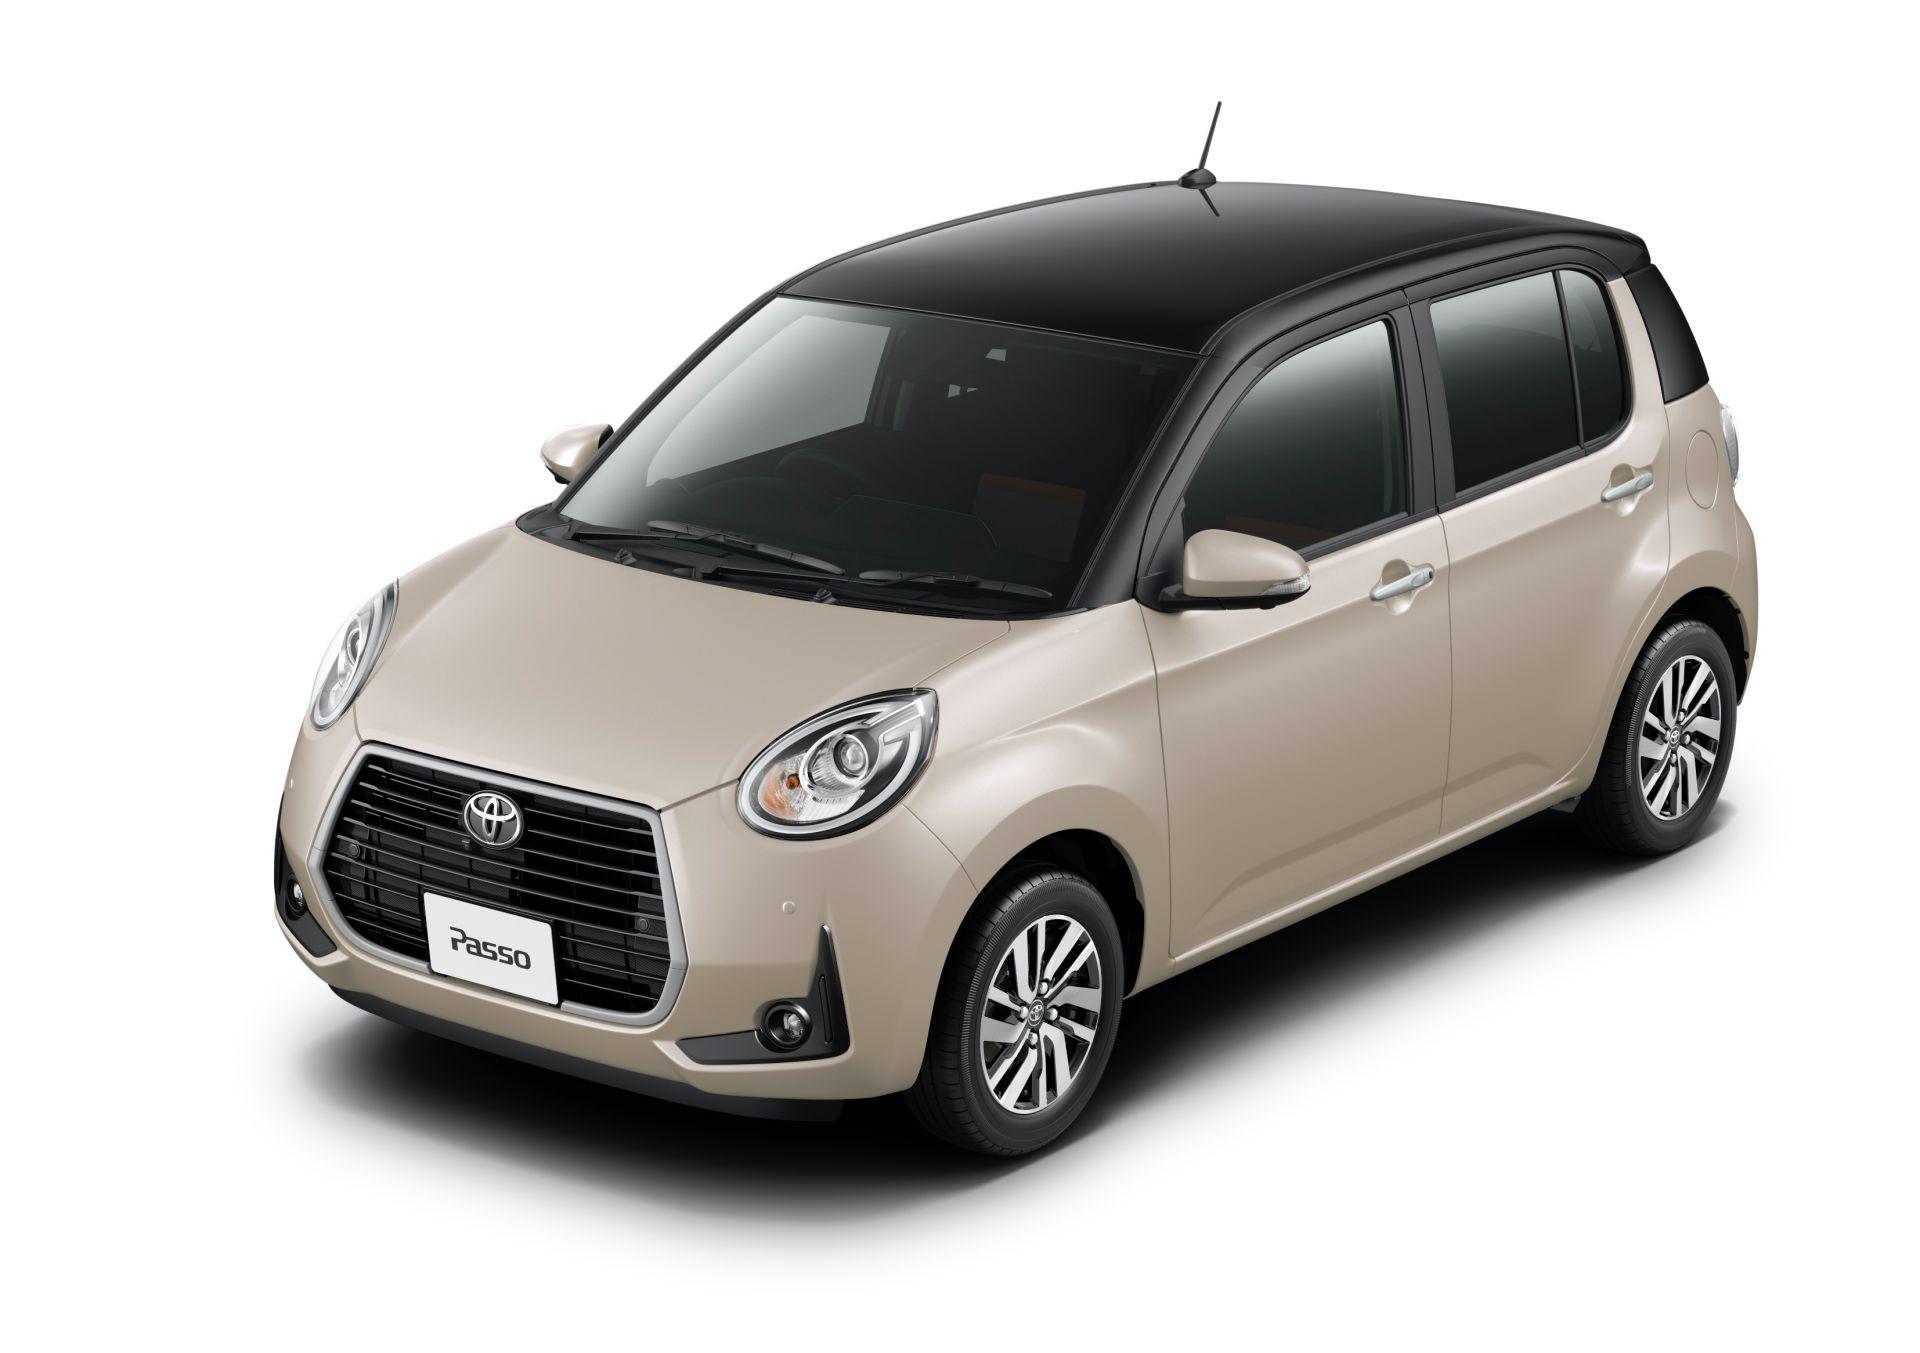 Toyota_Passo_Moda_Charm_0010